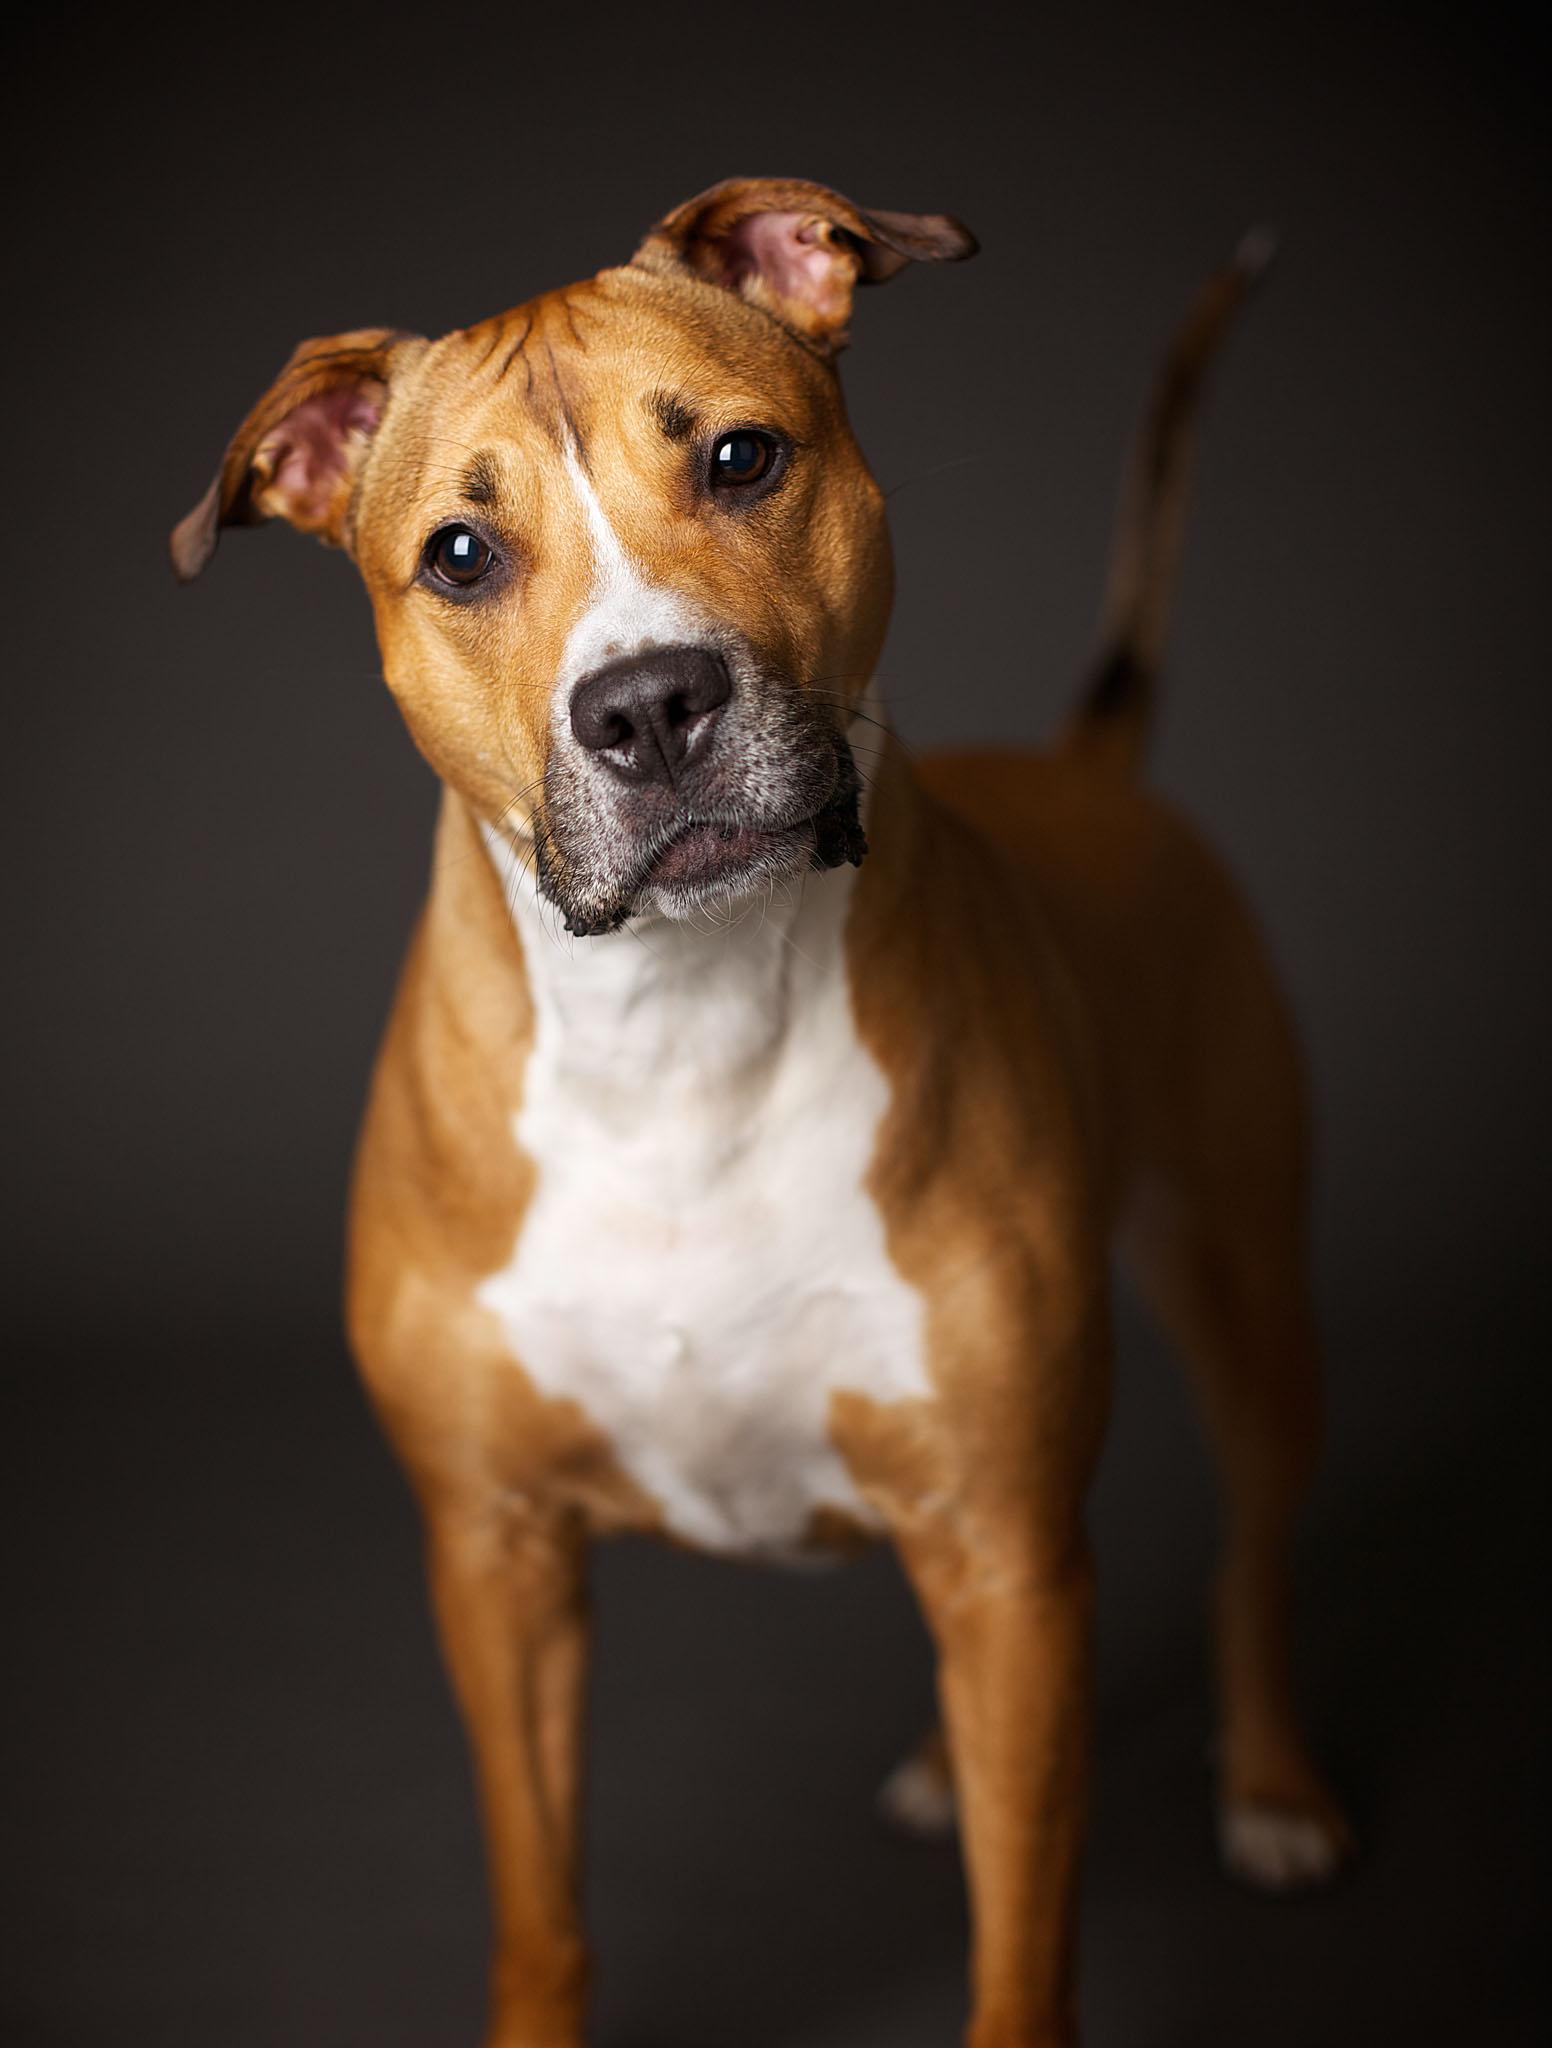 boprey-pet-photography-studio-nyc_29.jpg